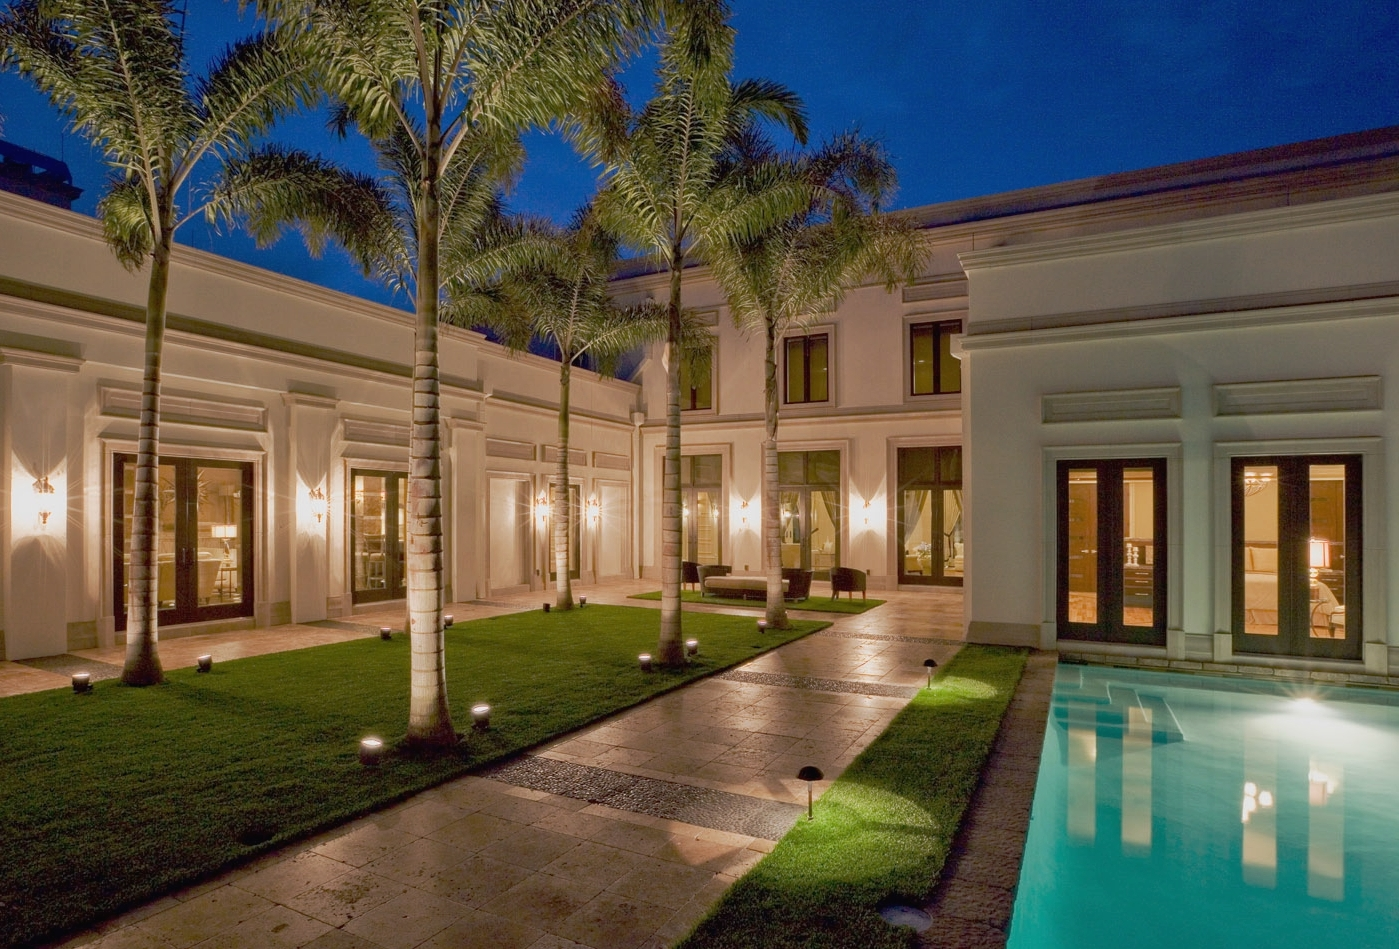 The New American Home, Orlando